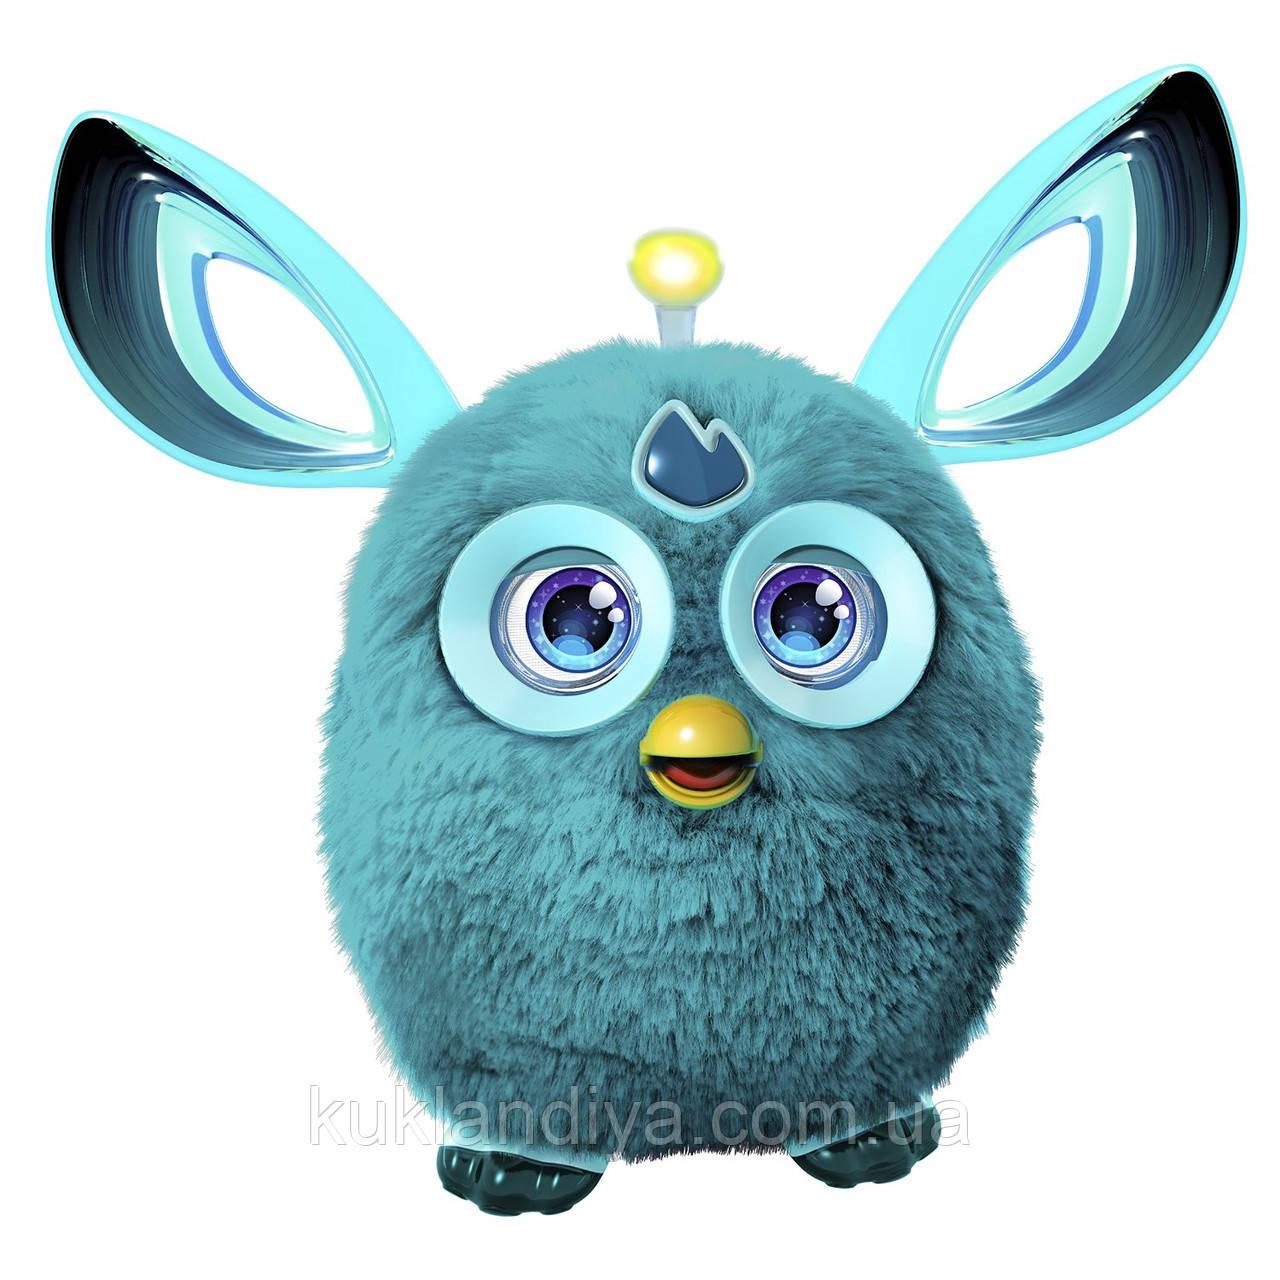 Интерактивный Furby Connect Бирюзовый Hasbro